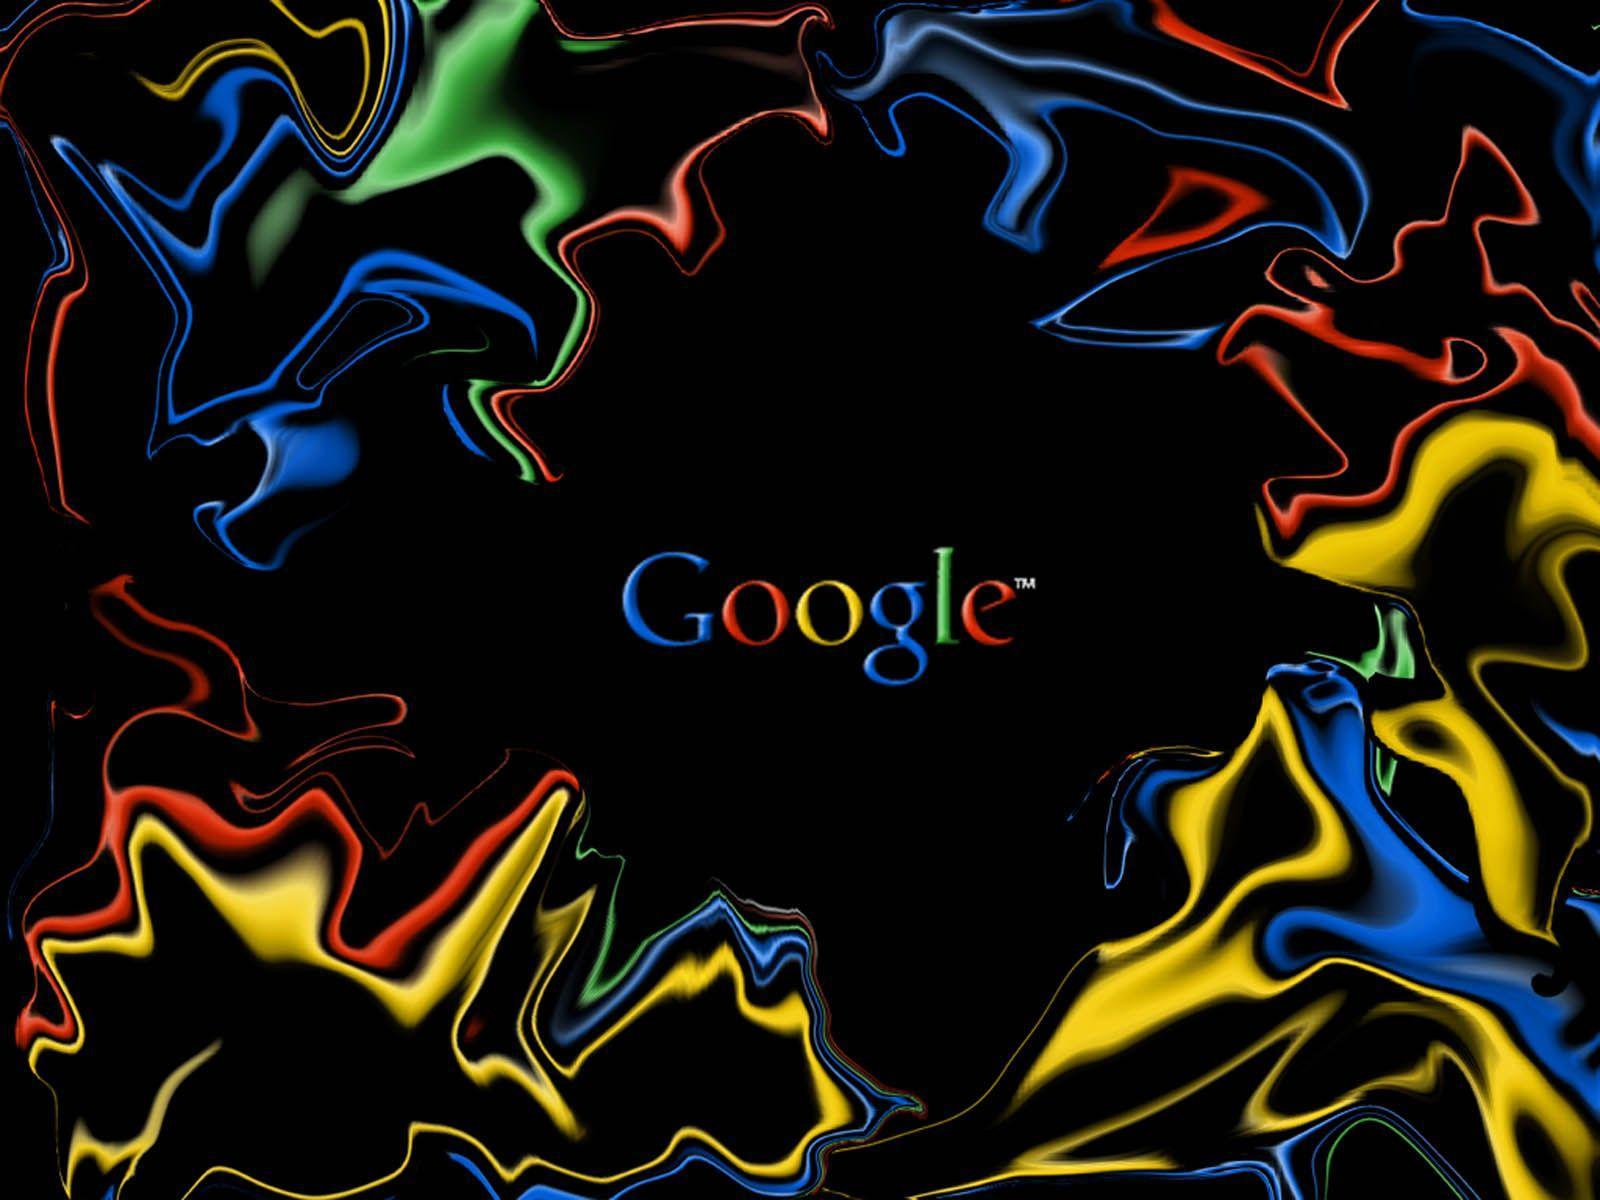 Google Backgrounds - Wallpaper Cave